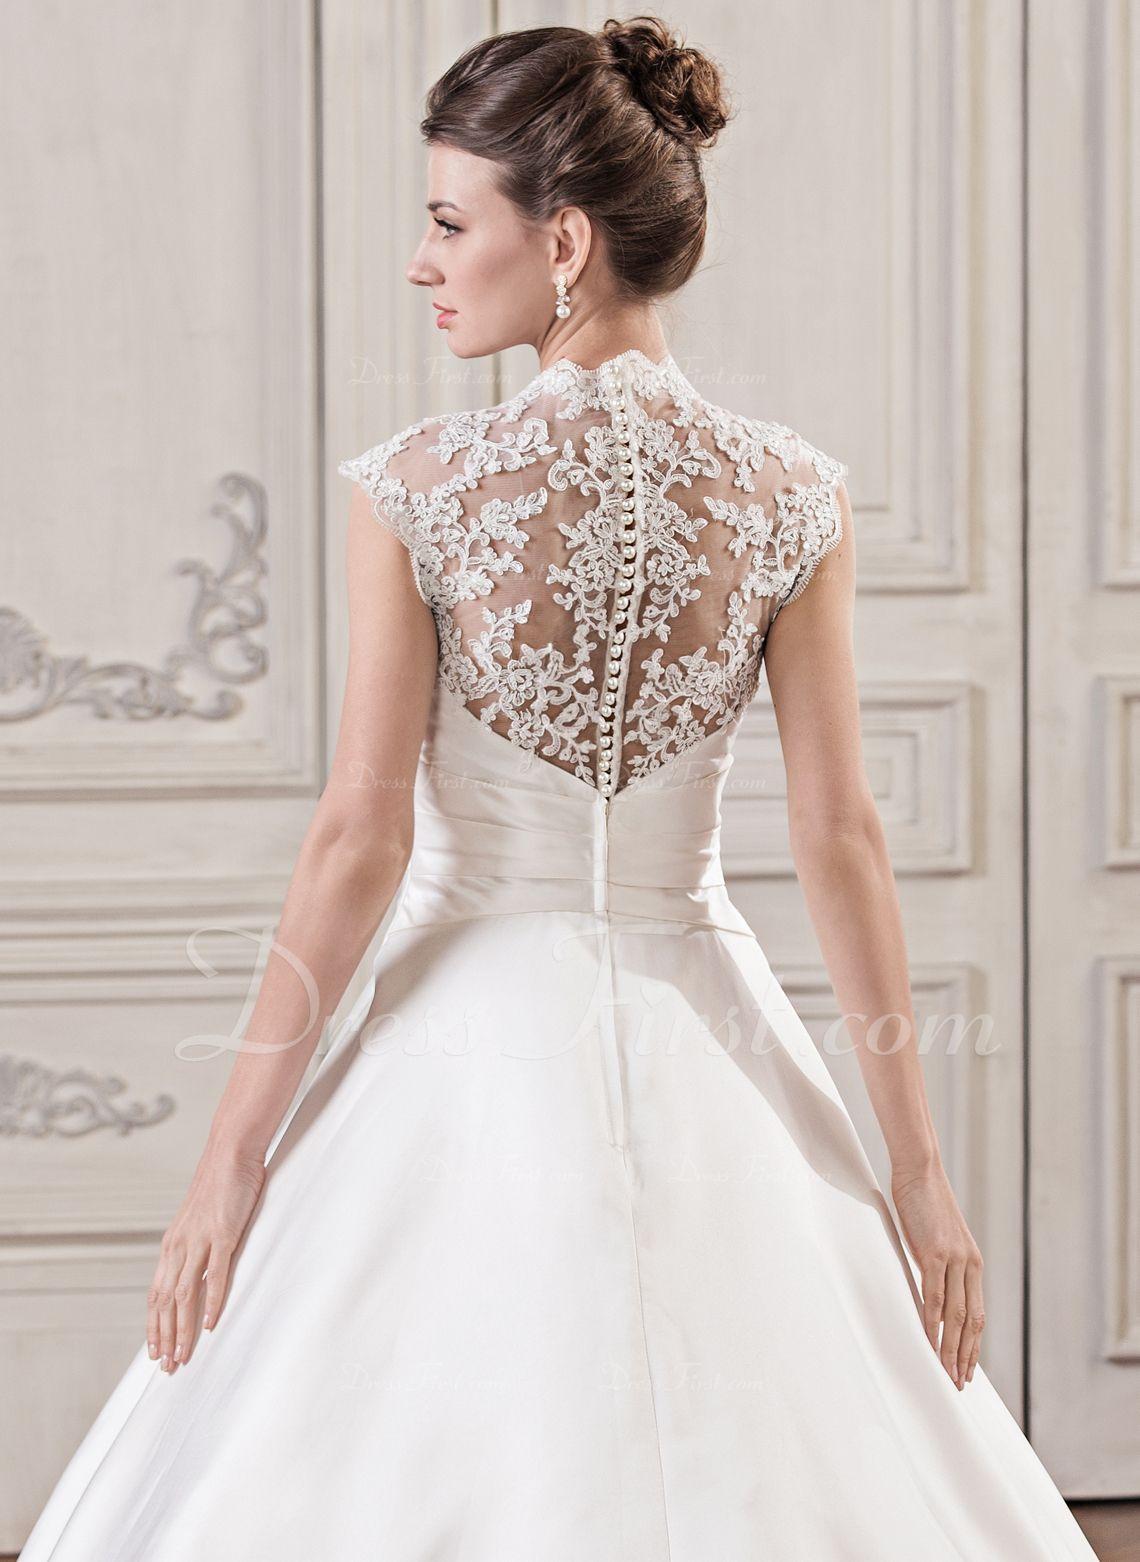 BallGown Vneck Court Train Satin Lace Wedding Dress With